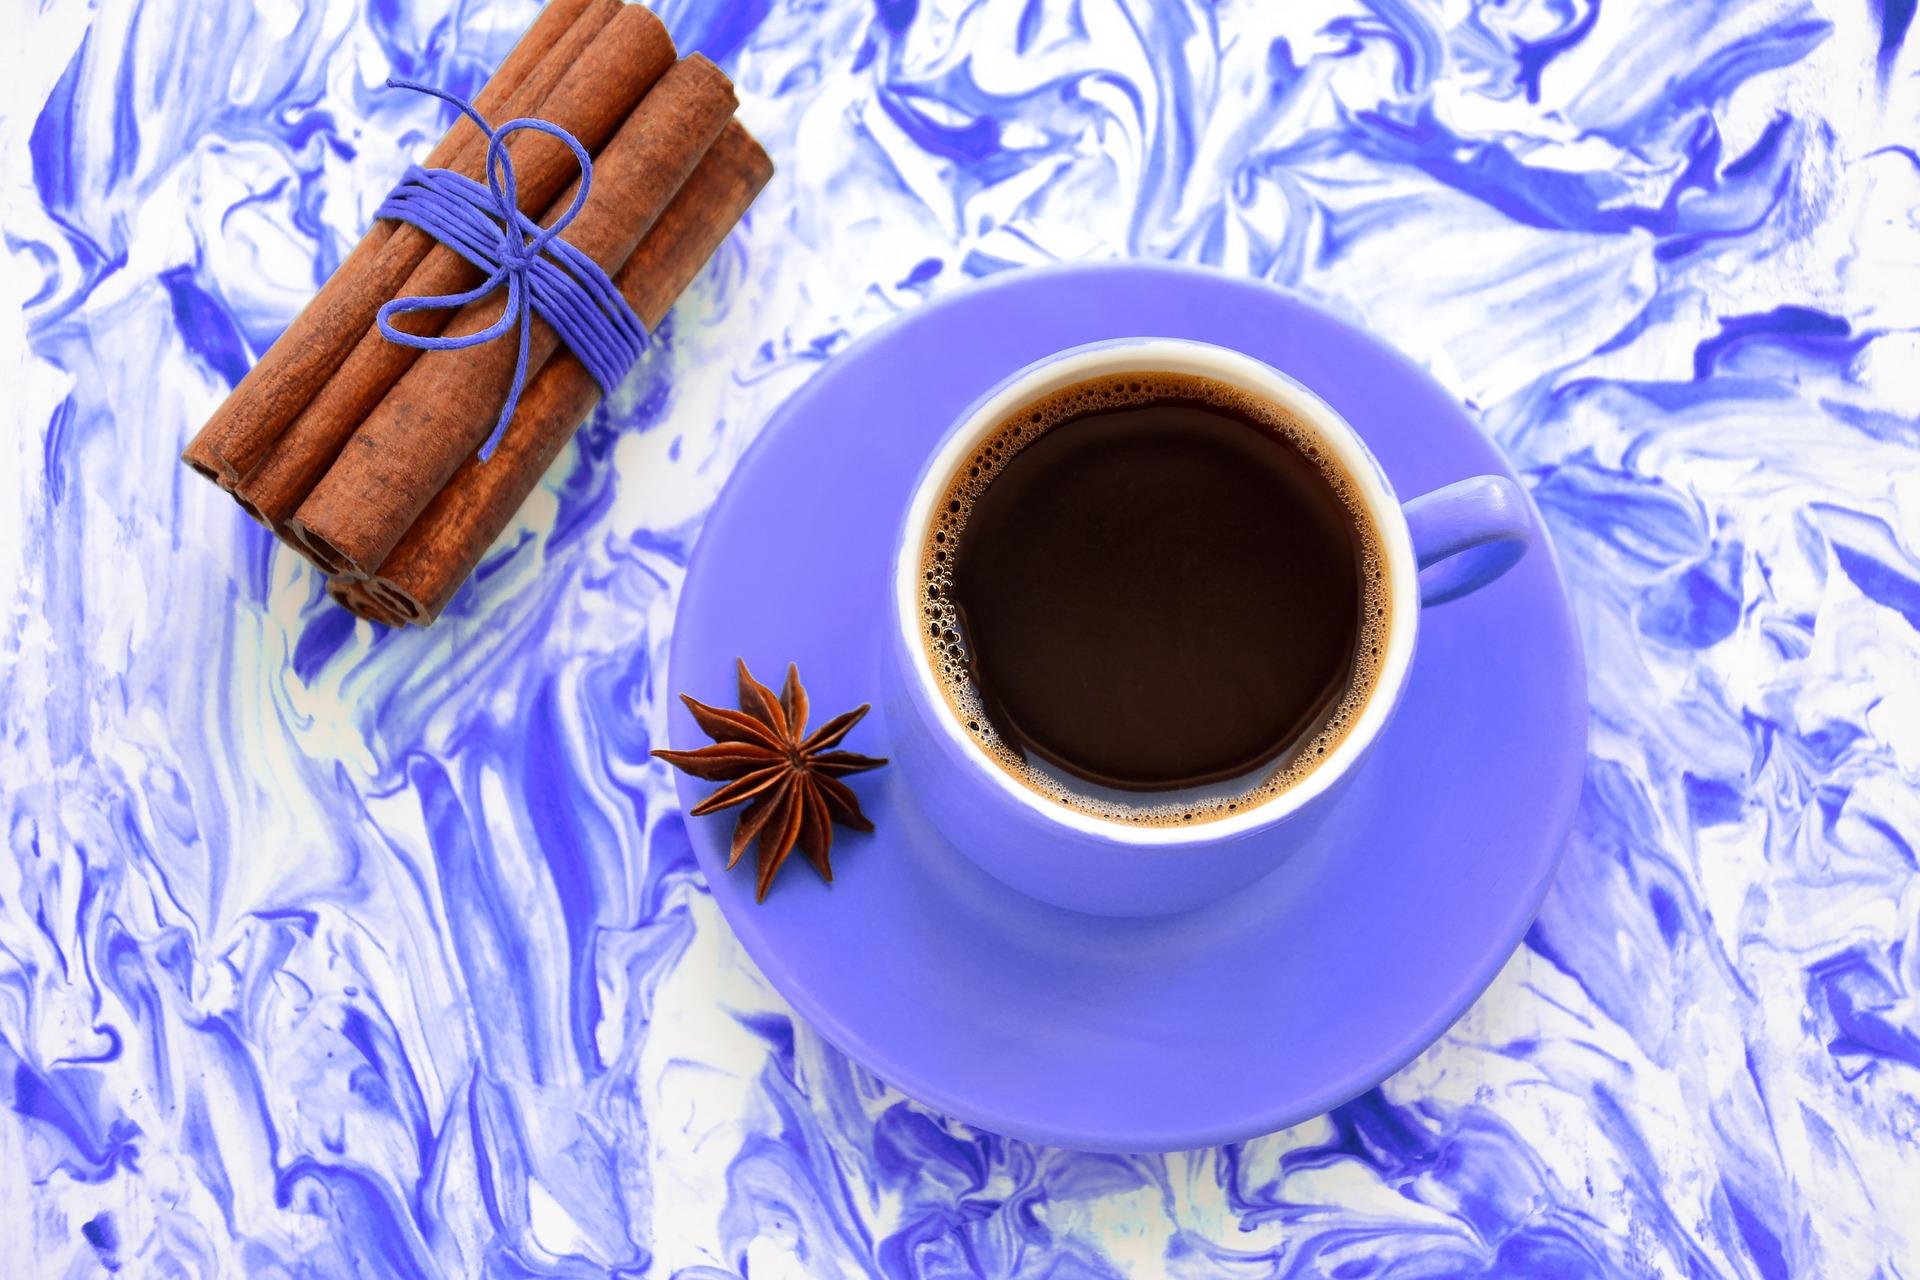 coffee-4131275_1920.jpg